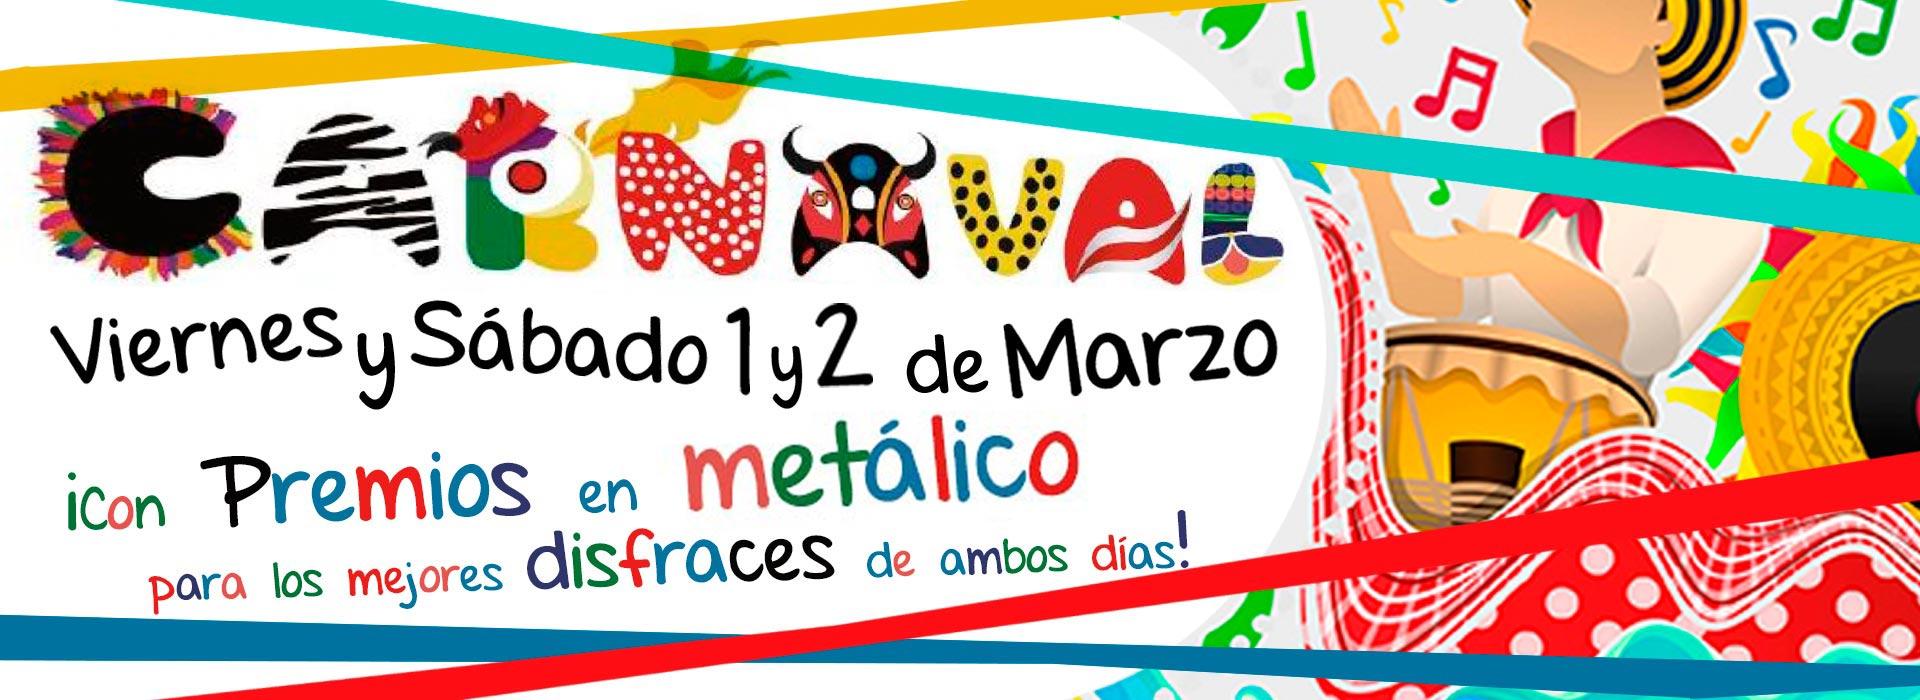 Carnaval-Marzo2019